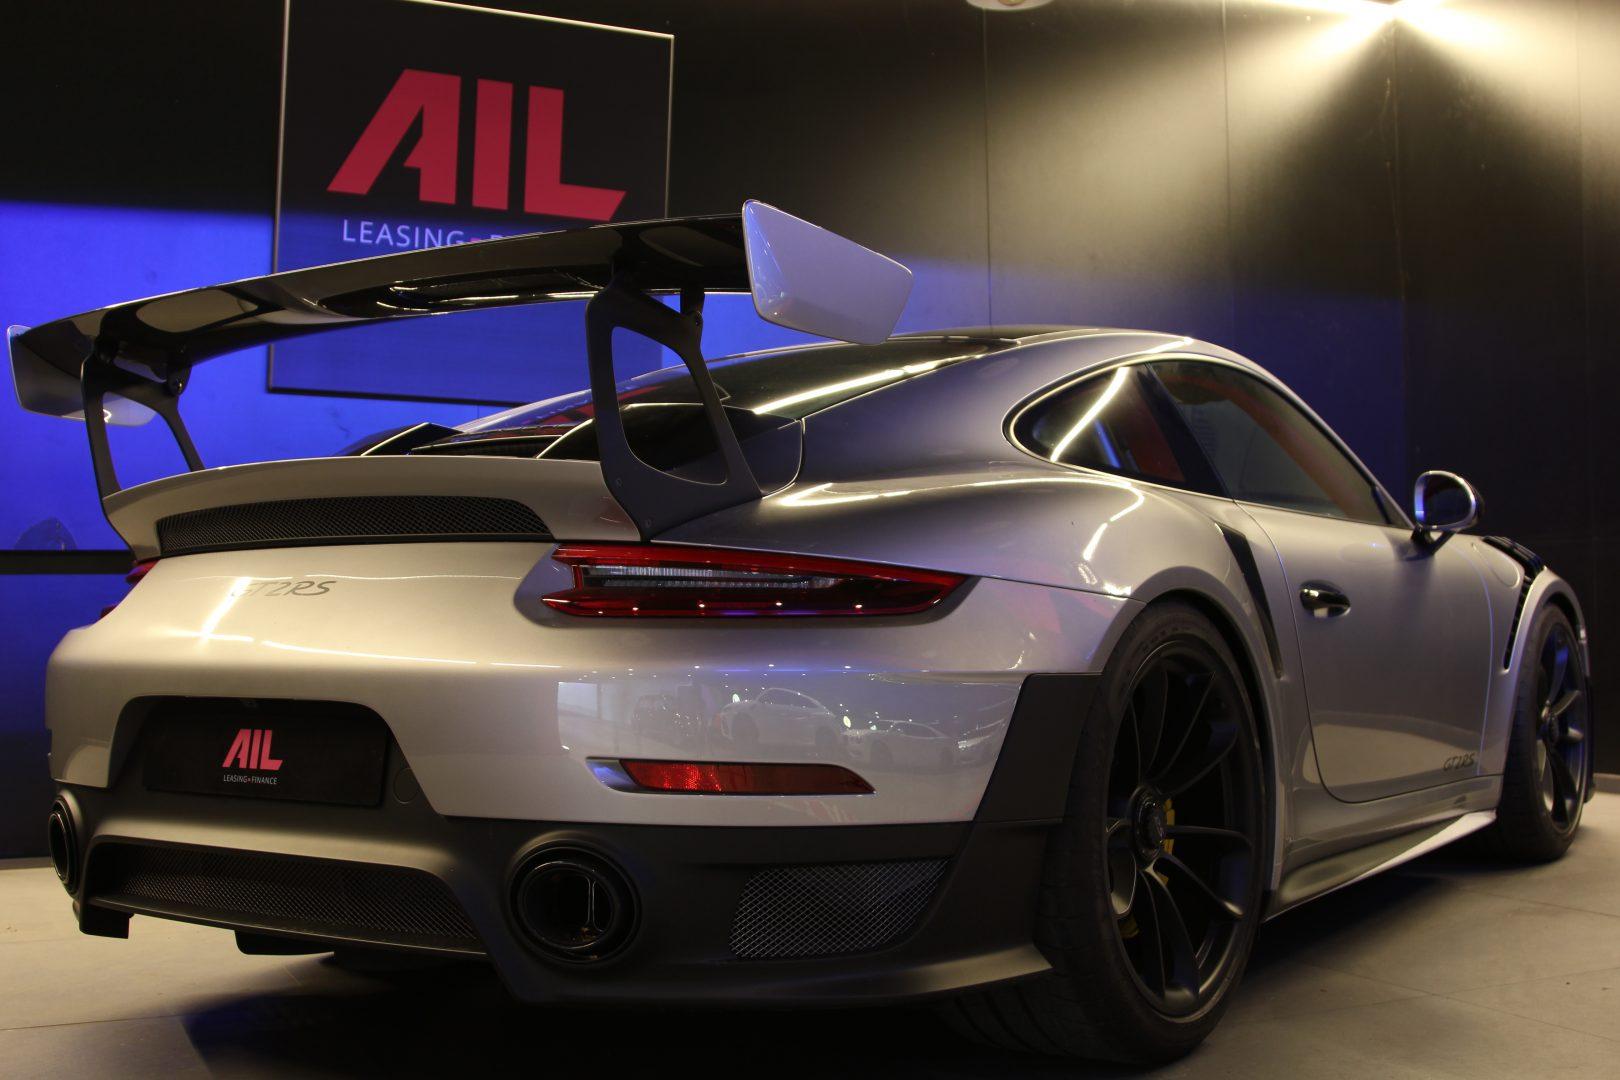 AIL Porsche 991 GT2 RS Weissach-Paket 9